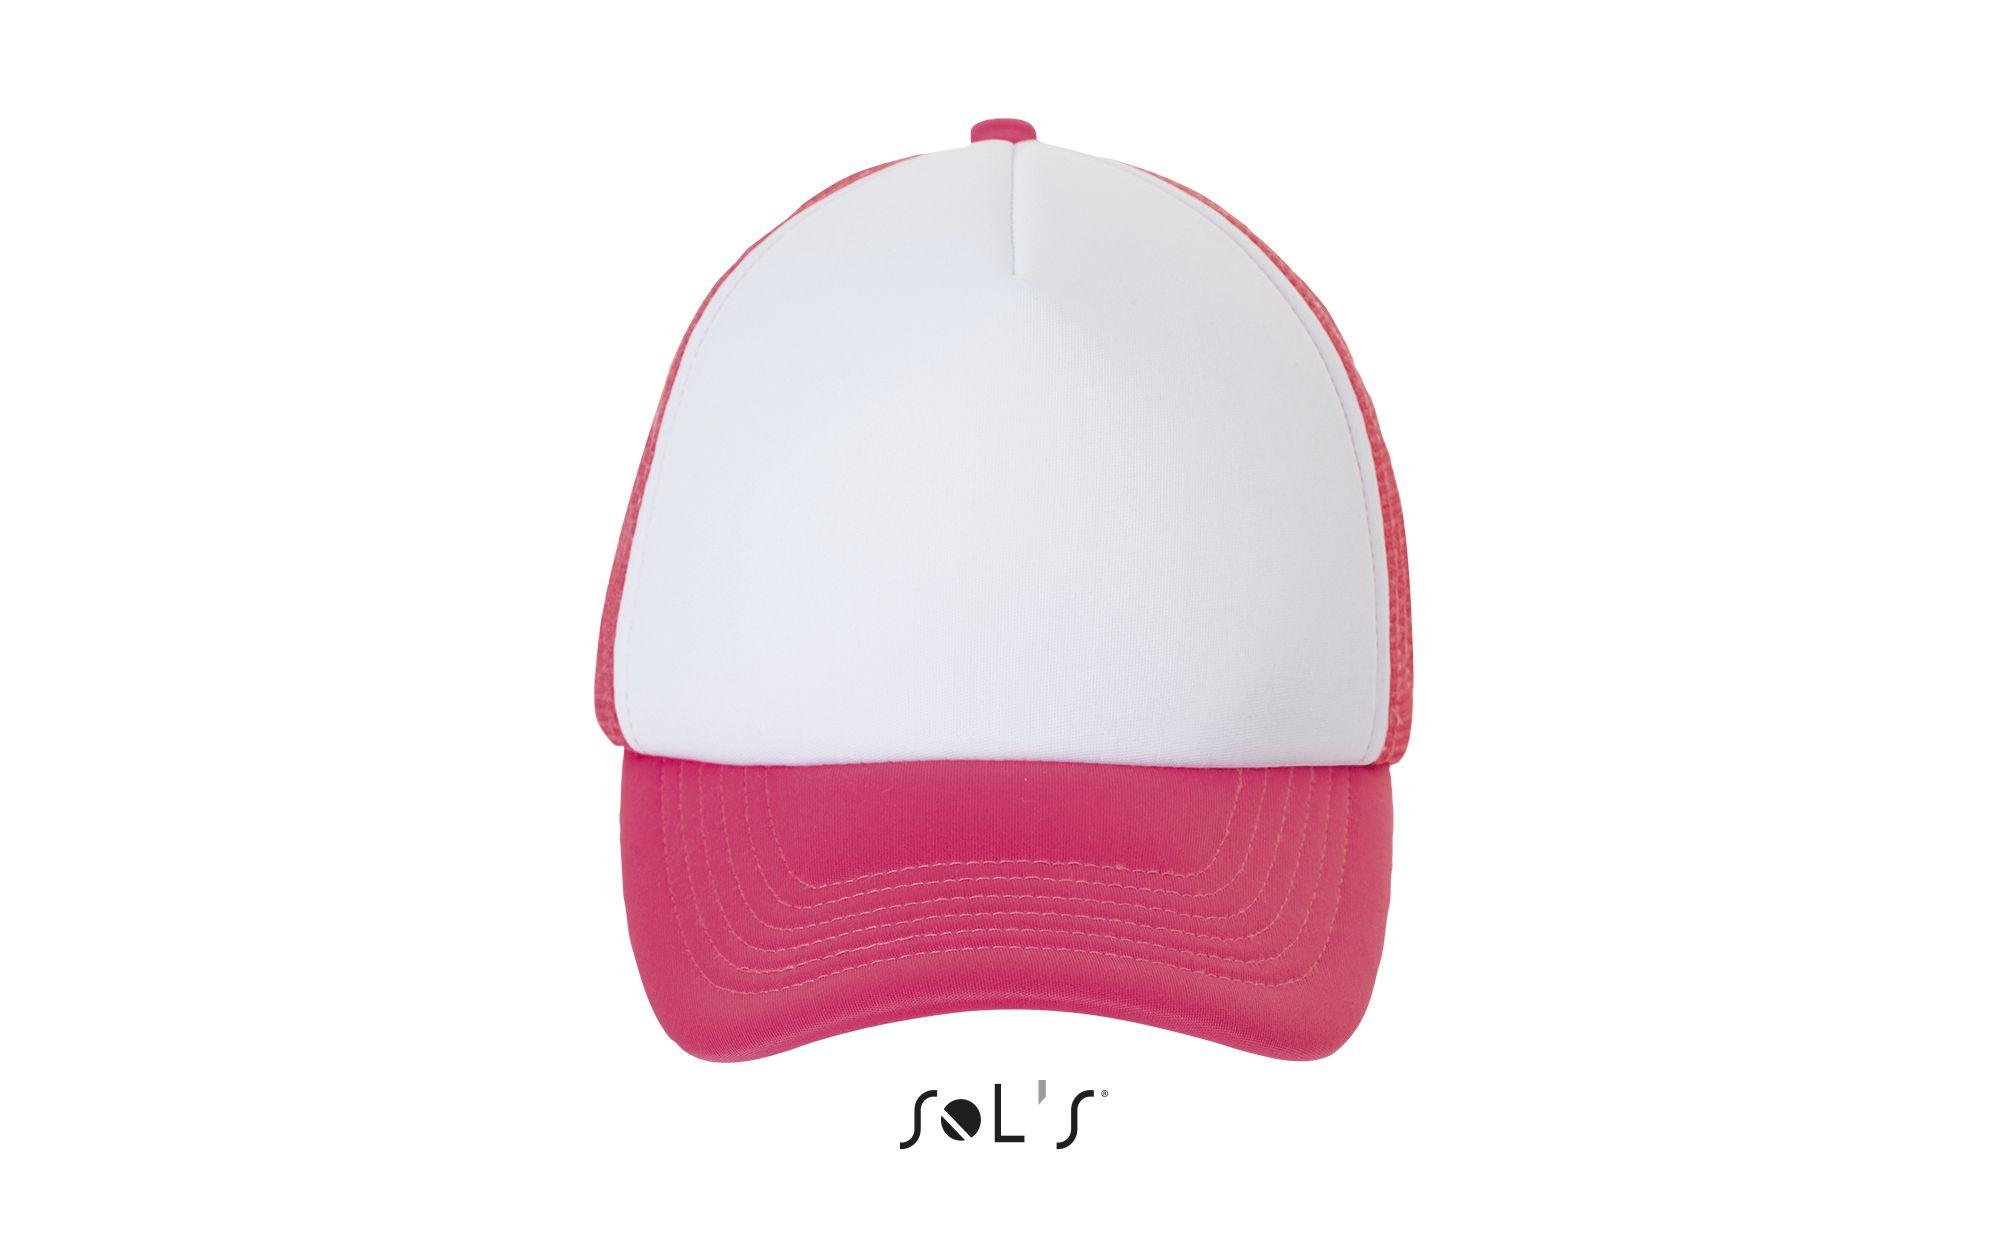 515 - Blanc / Corail fluo